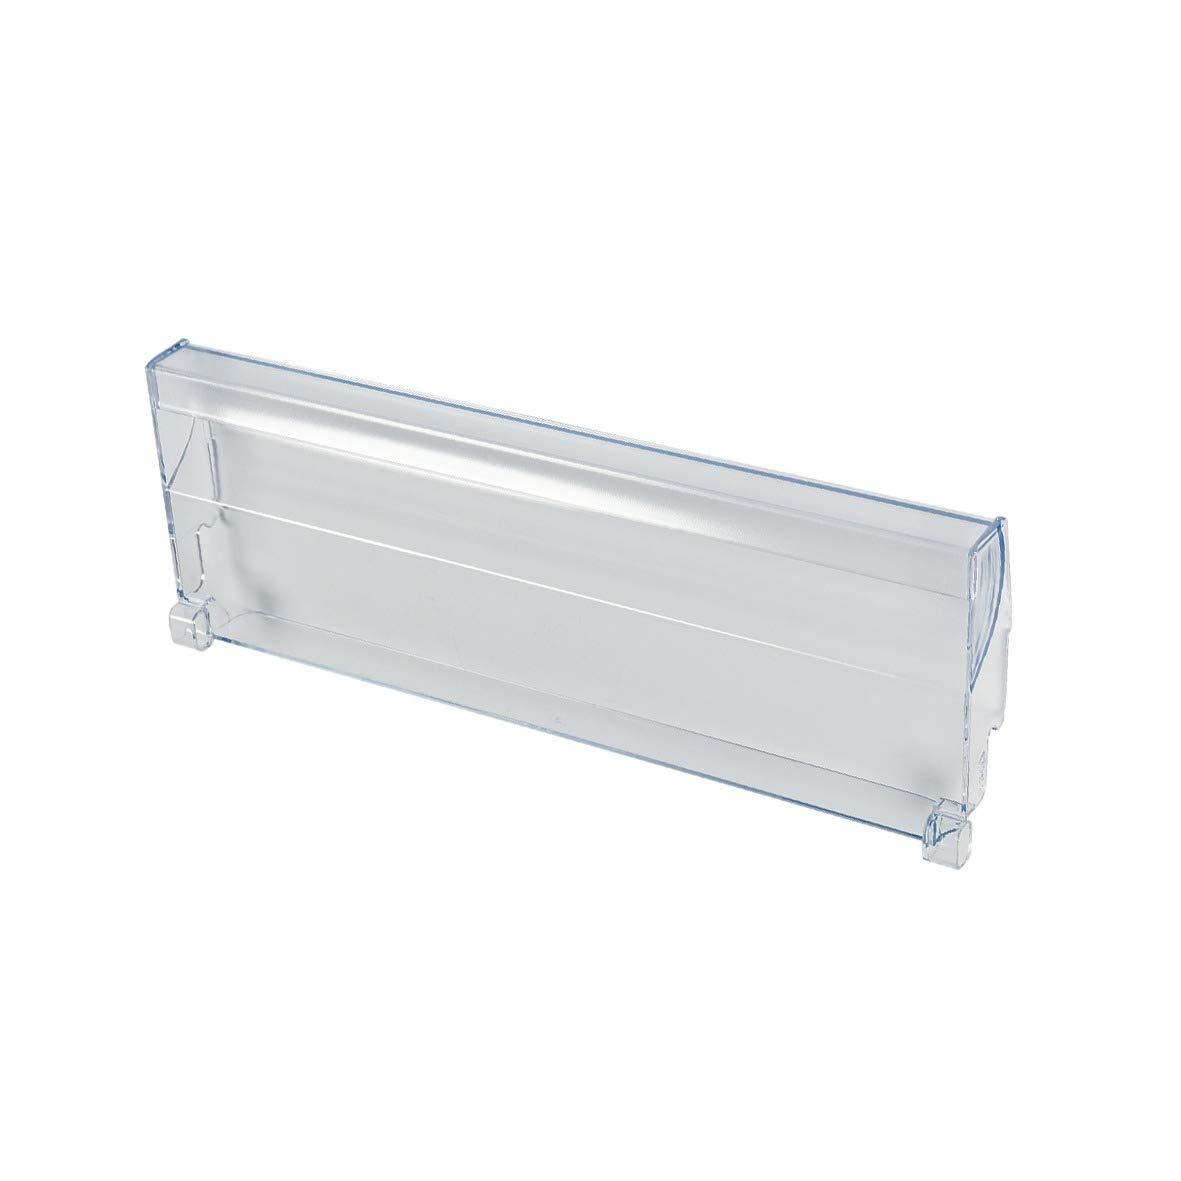 Bosch Siemens freezer flap flap refrigerator 00708732 708732 ...